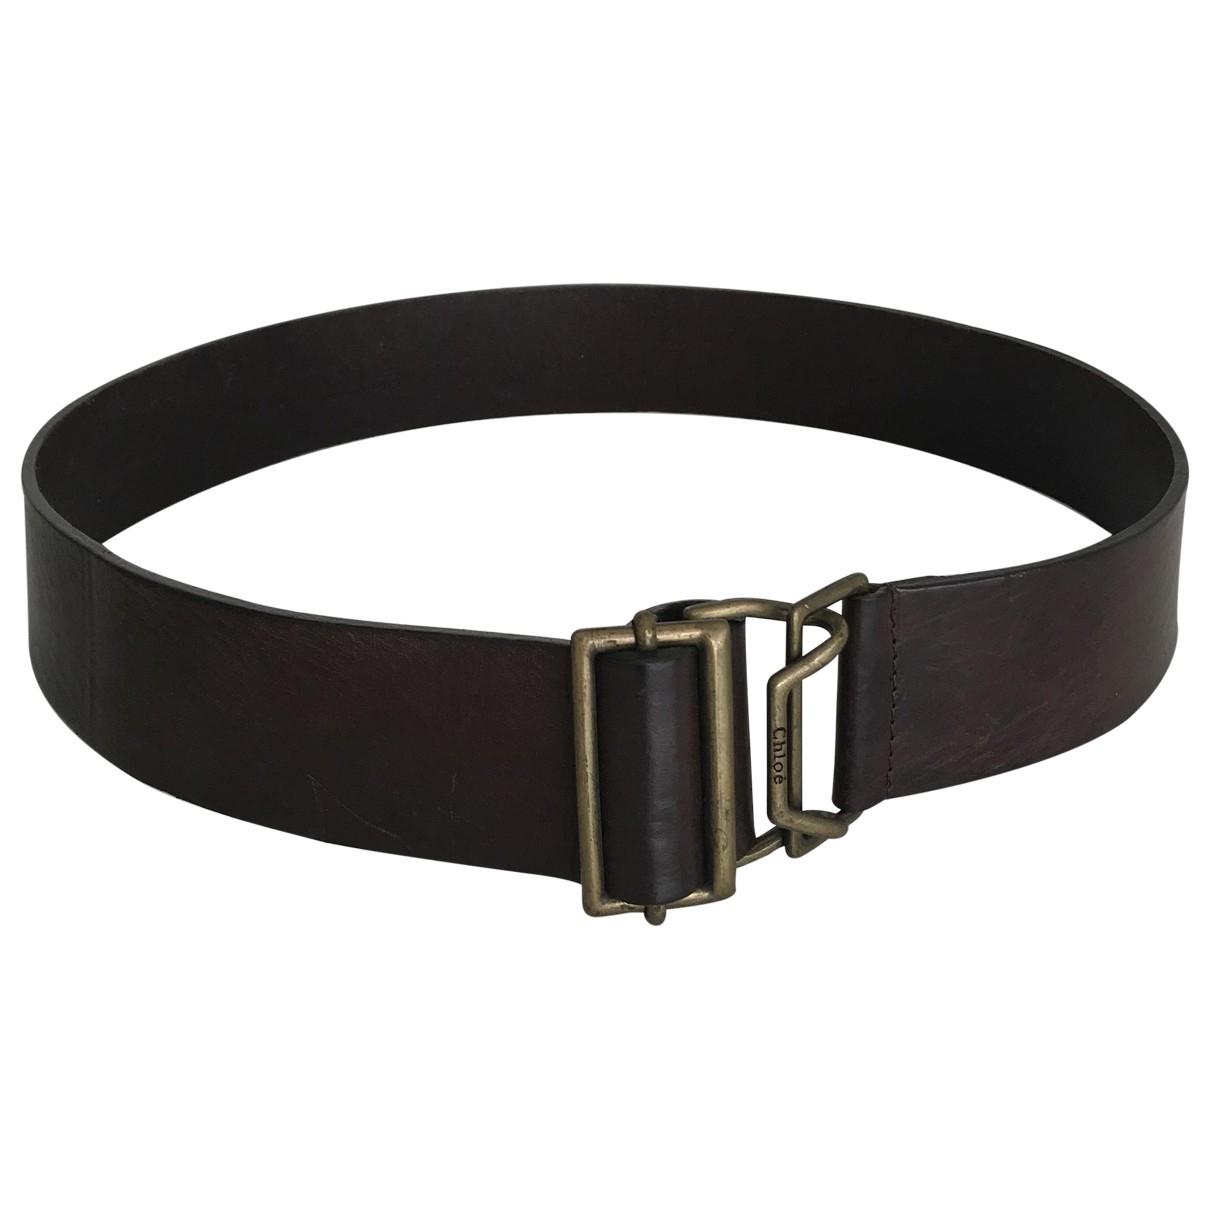 Chloé \N Brown Leather belt for Women 85 cm